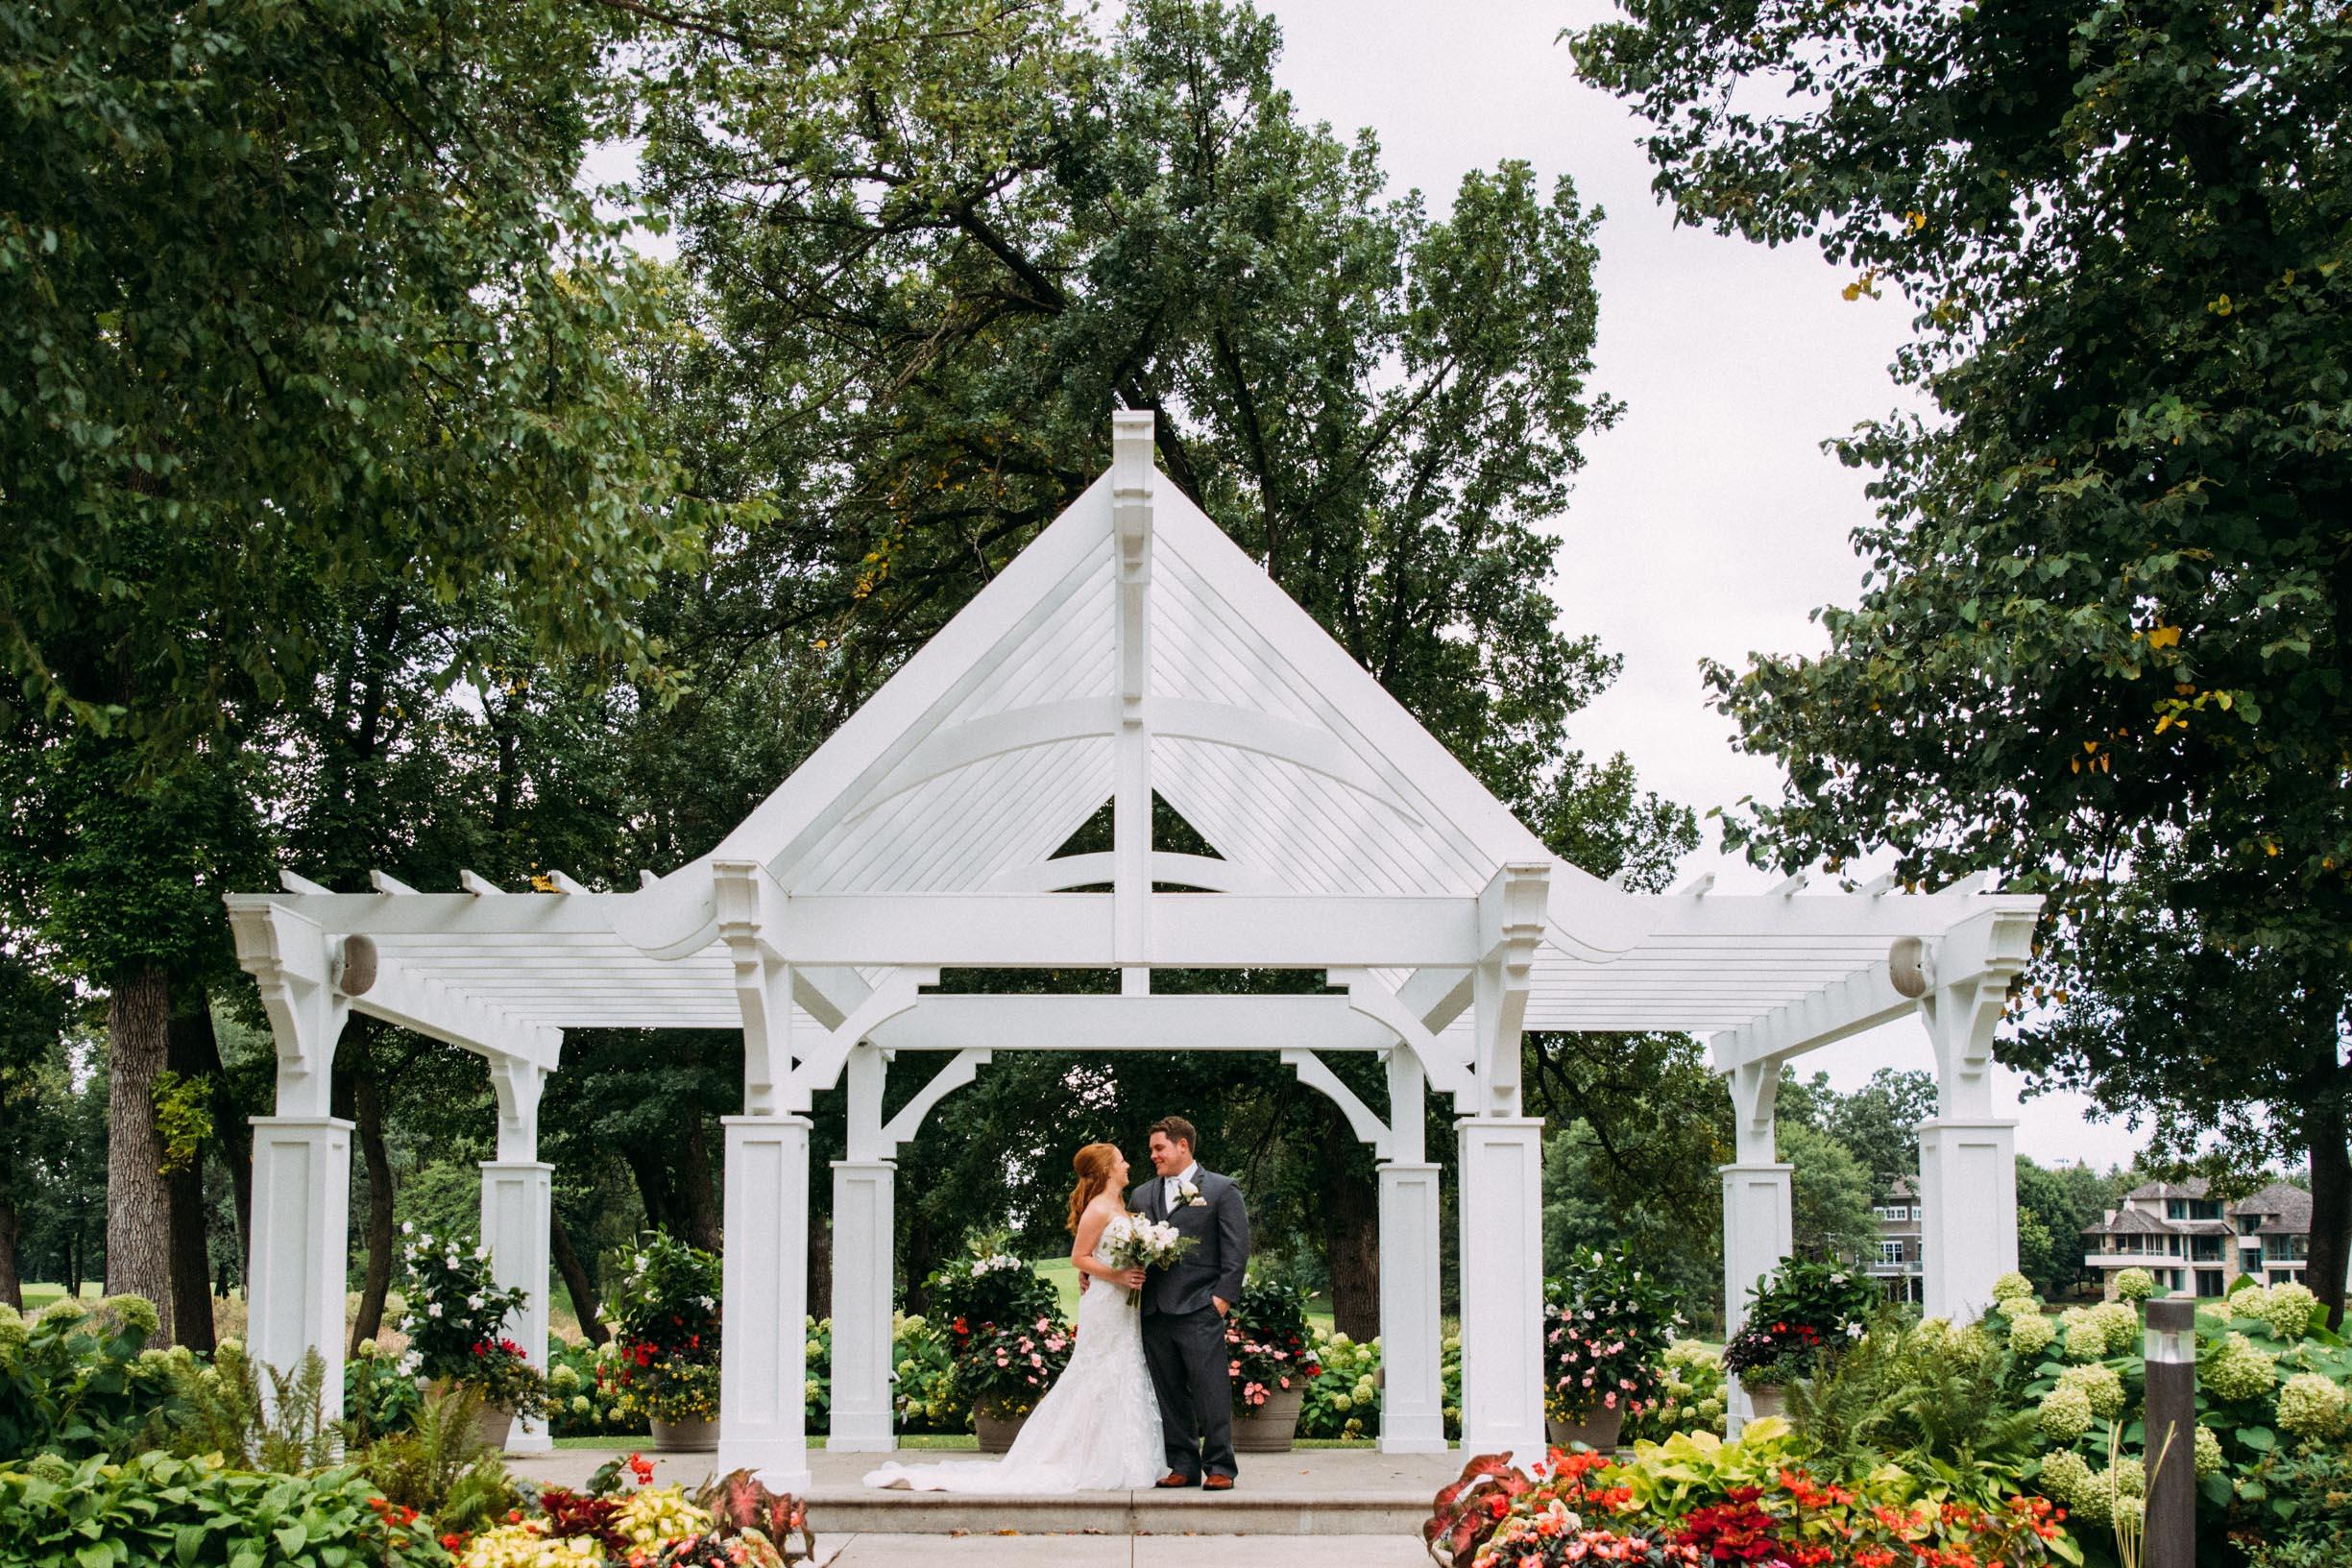 Megan_Zach_Minneapolis_Bearpath_Wedding_Blog-20.jpg